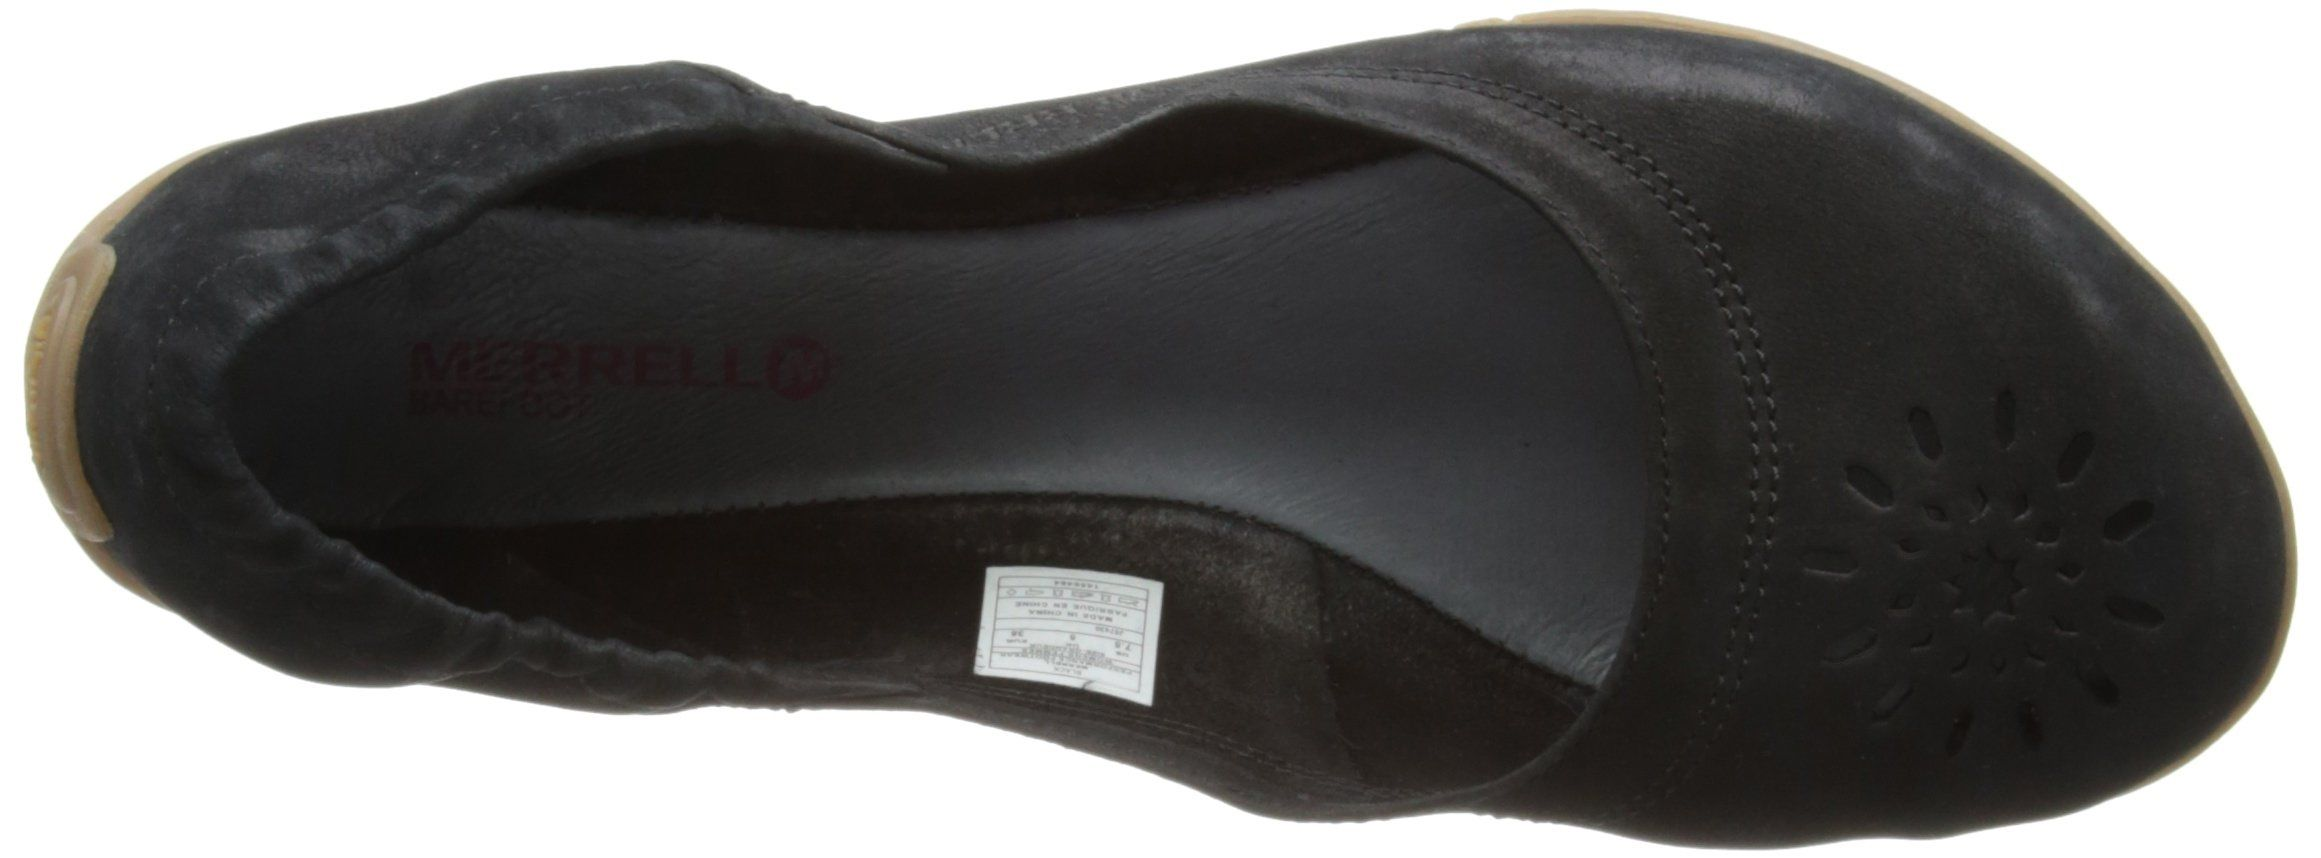 Amazon.com: Merrell Women's Barefoot Life Zest Glove Flat: Merrell: Shoes